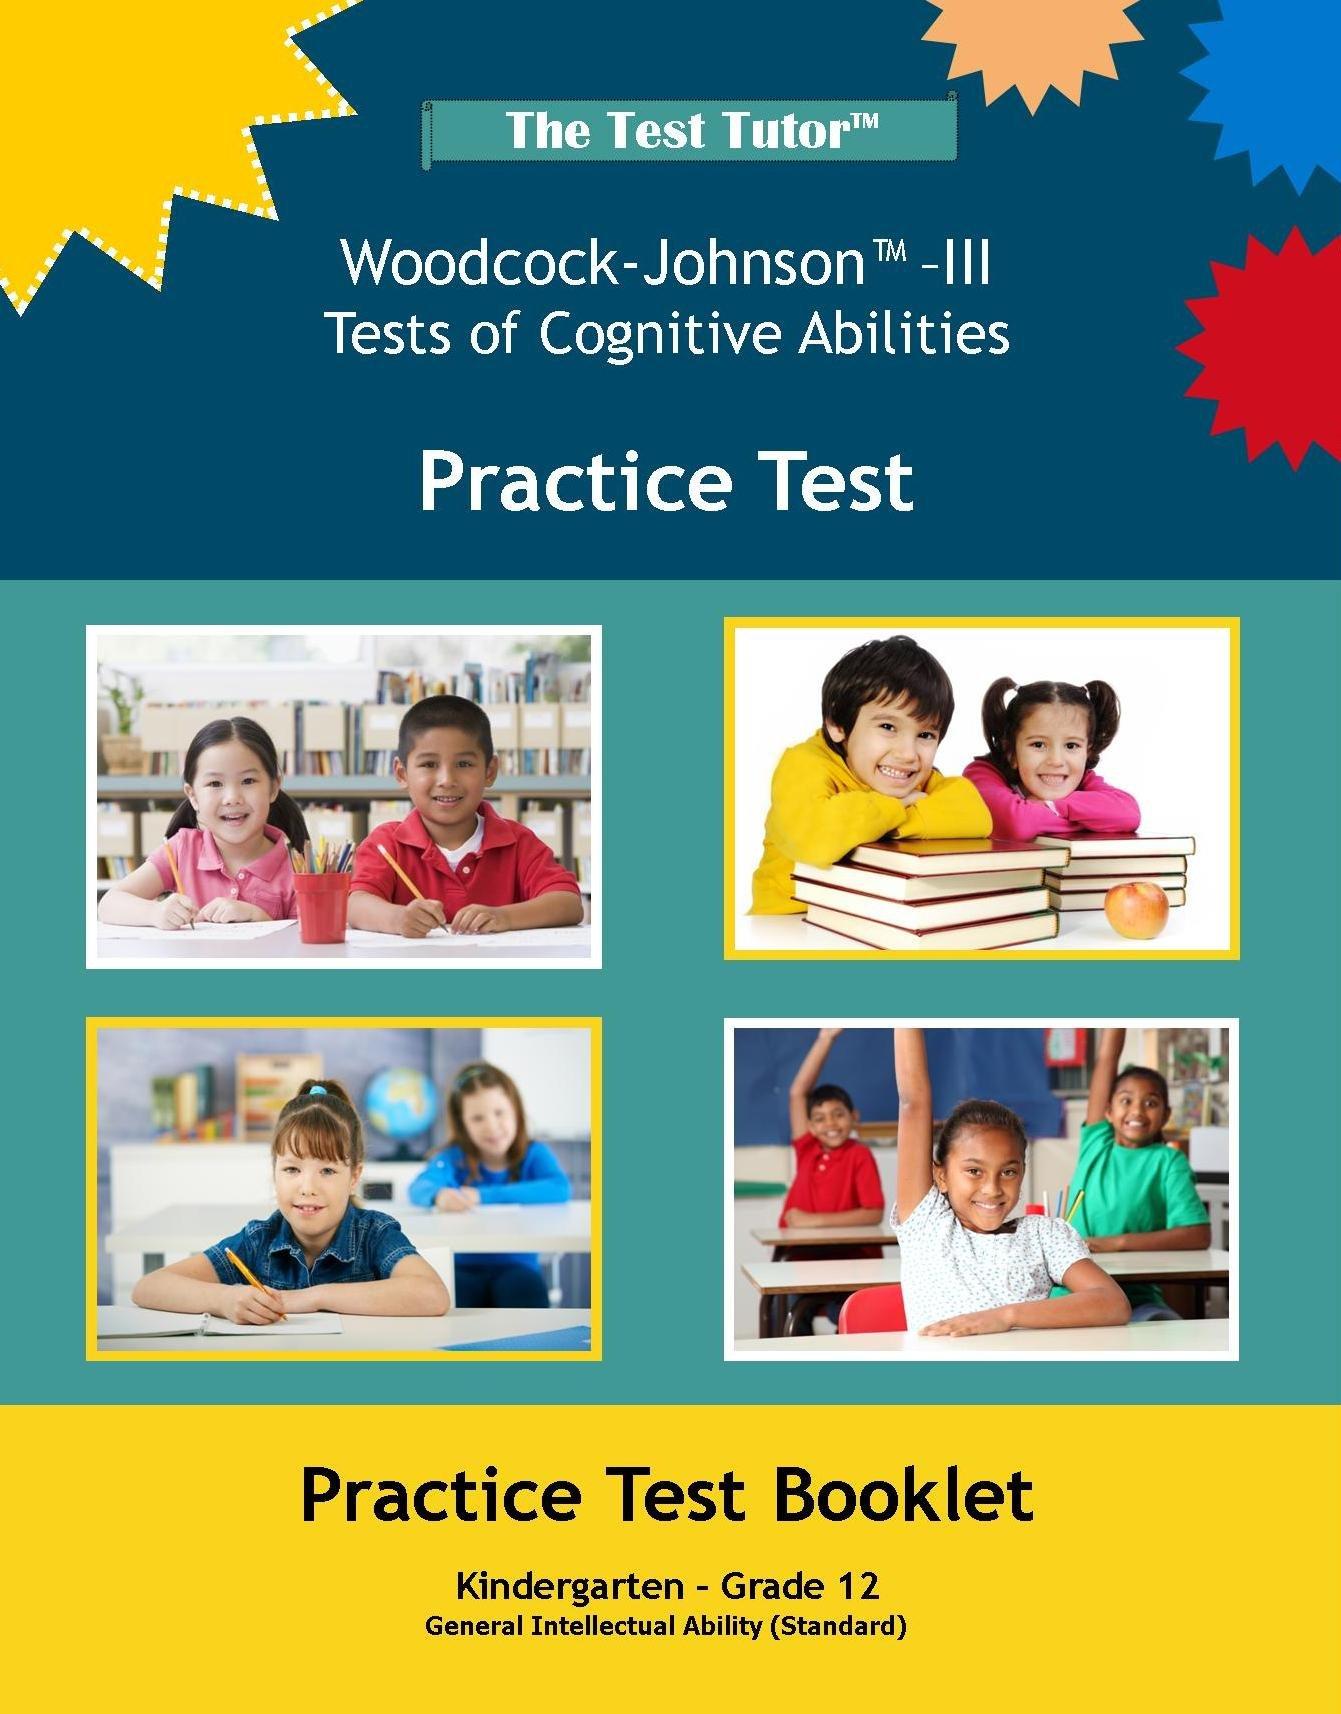 The Test Tutor: Woodcock-Johnson III Cognitive Abilities Practice ...